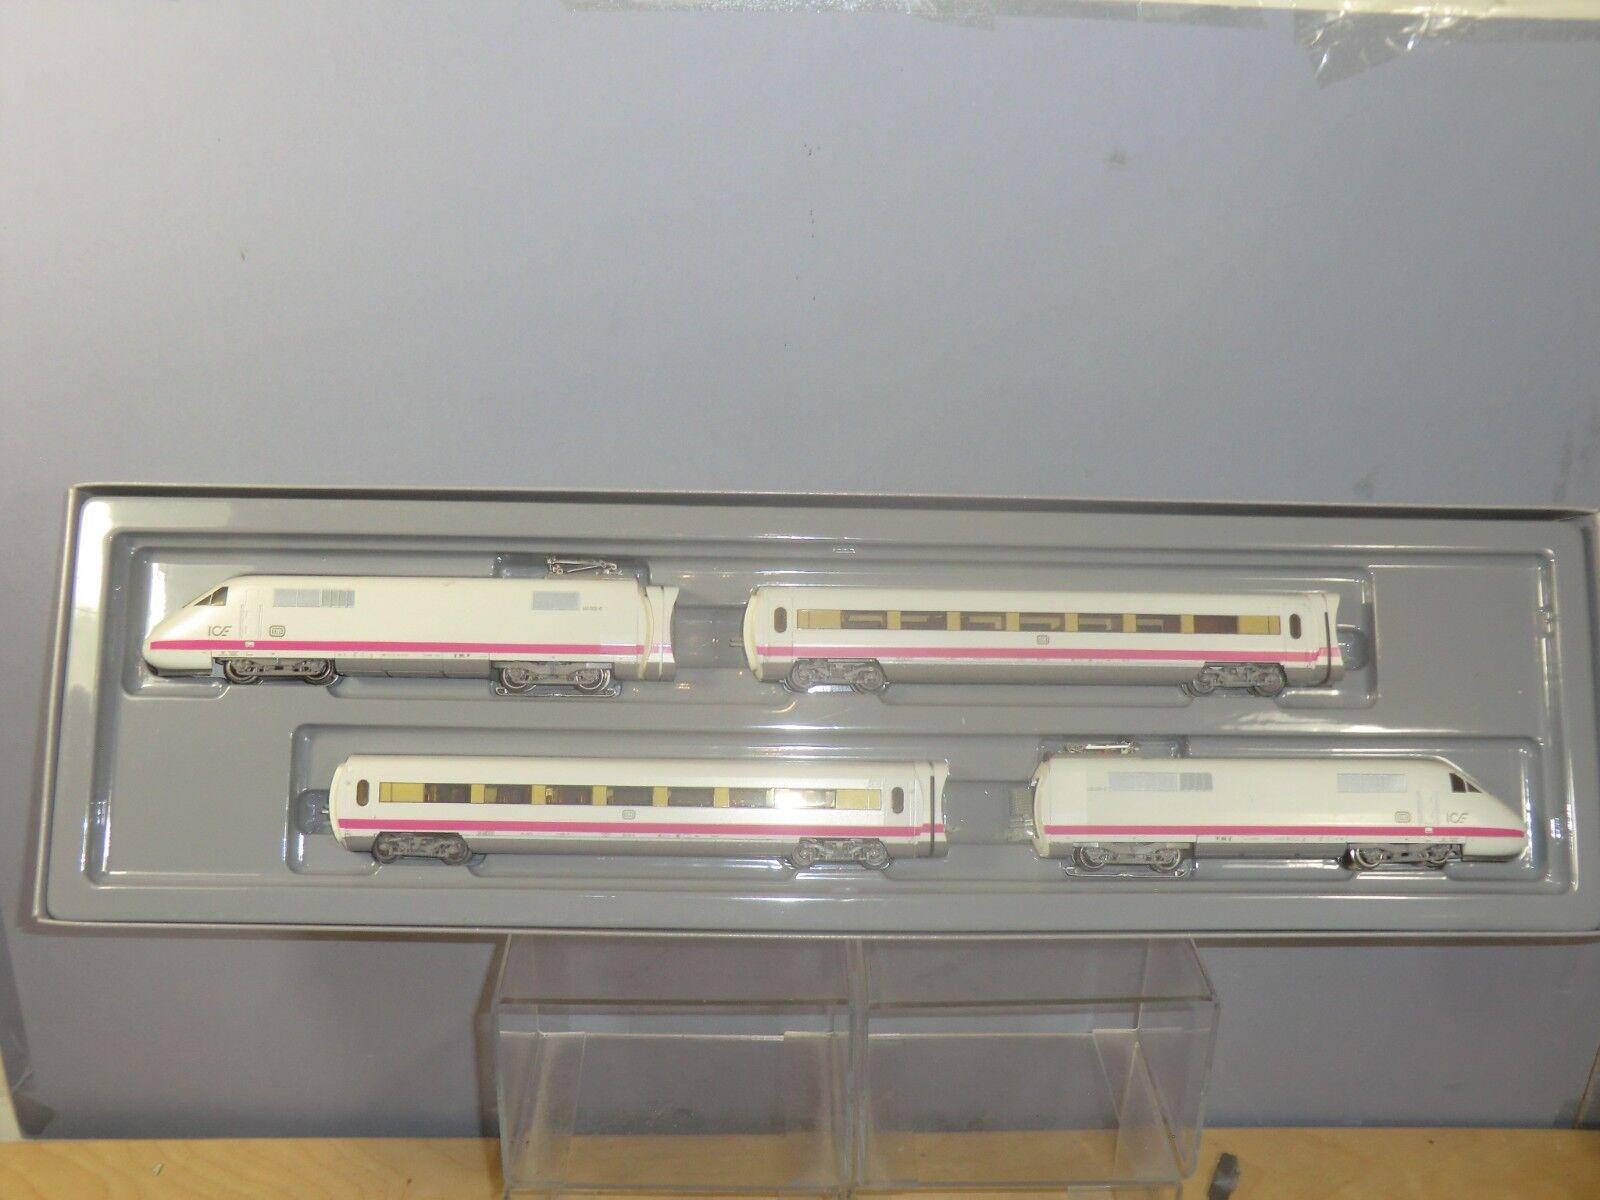 buscando agente de ventas MARKLIN     MODEL No 3671 DB   ICE  PASSENGER TRAIN SET  VN MIB  Garantía 100% de ajuste